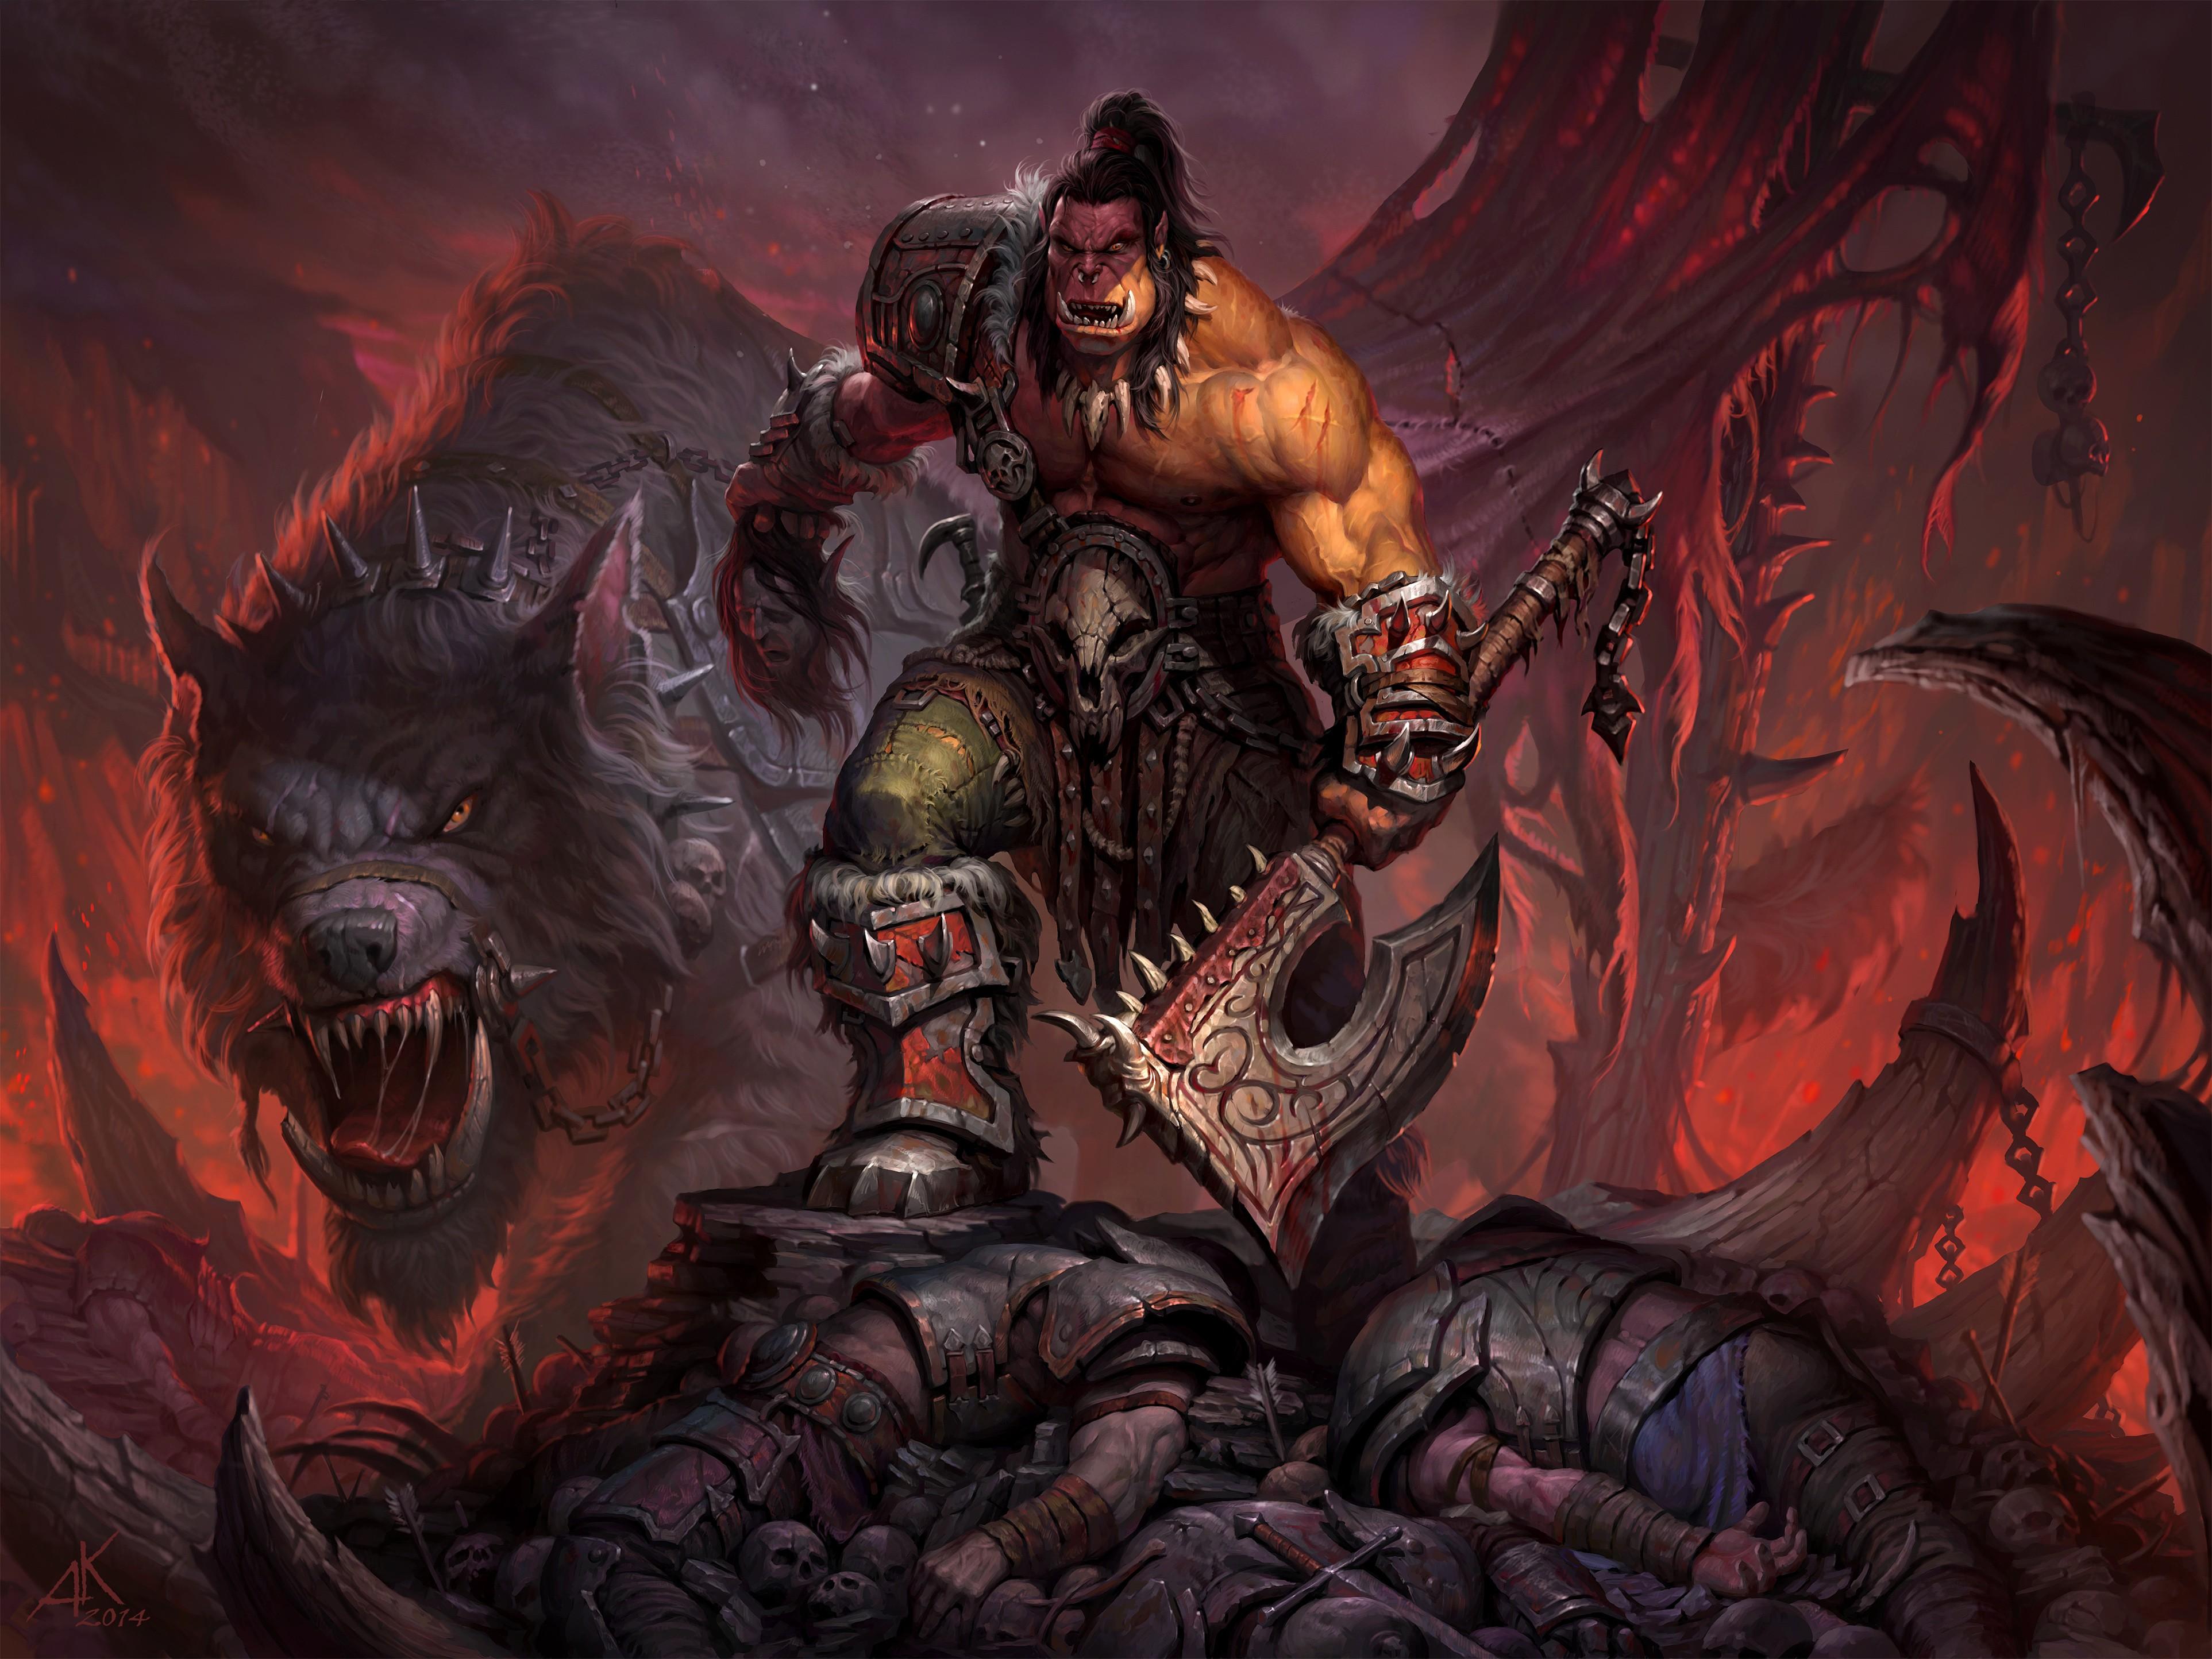 General 3850x2888 orcs axes creature World of Warcraft: Warlords of Draenor grommash hellscream World of Warcraft warrior video games DeviantArt video game art PC gaming fantasy art